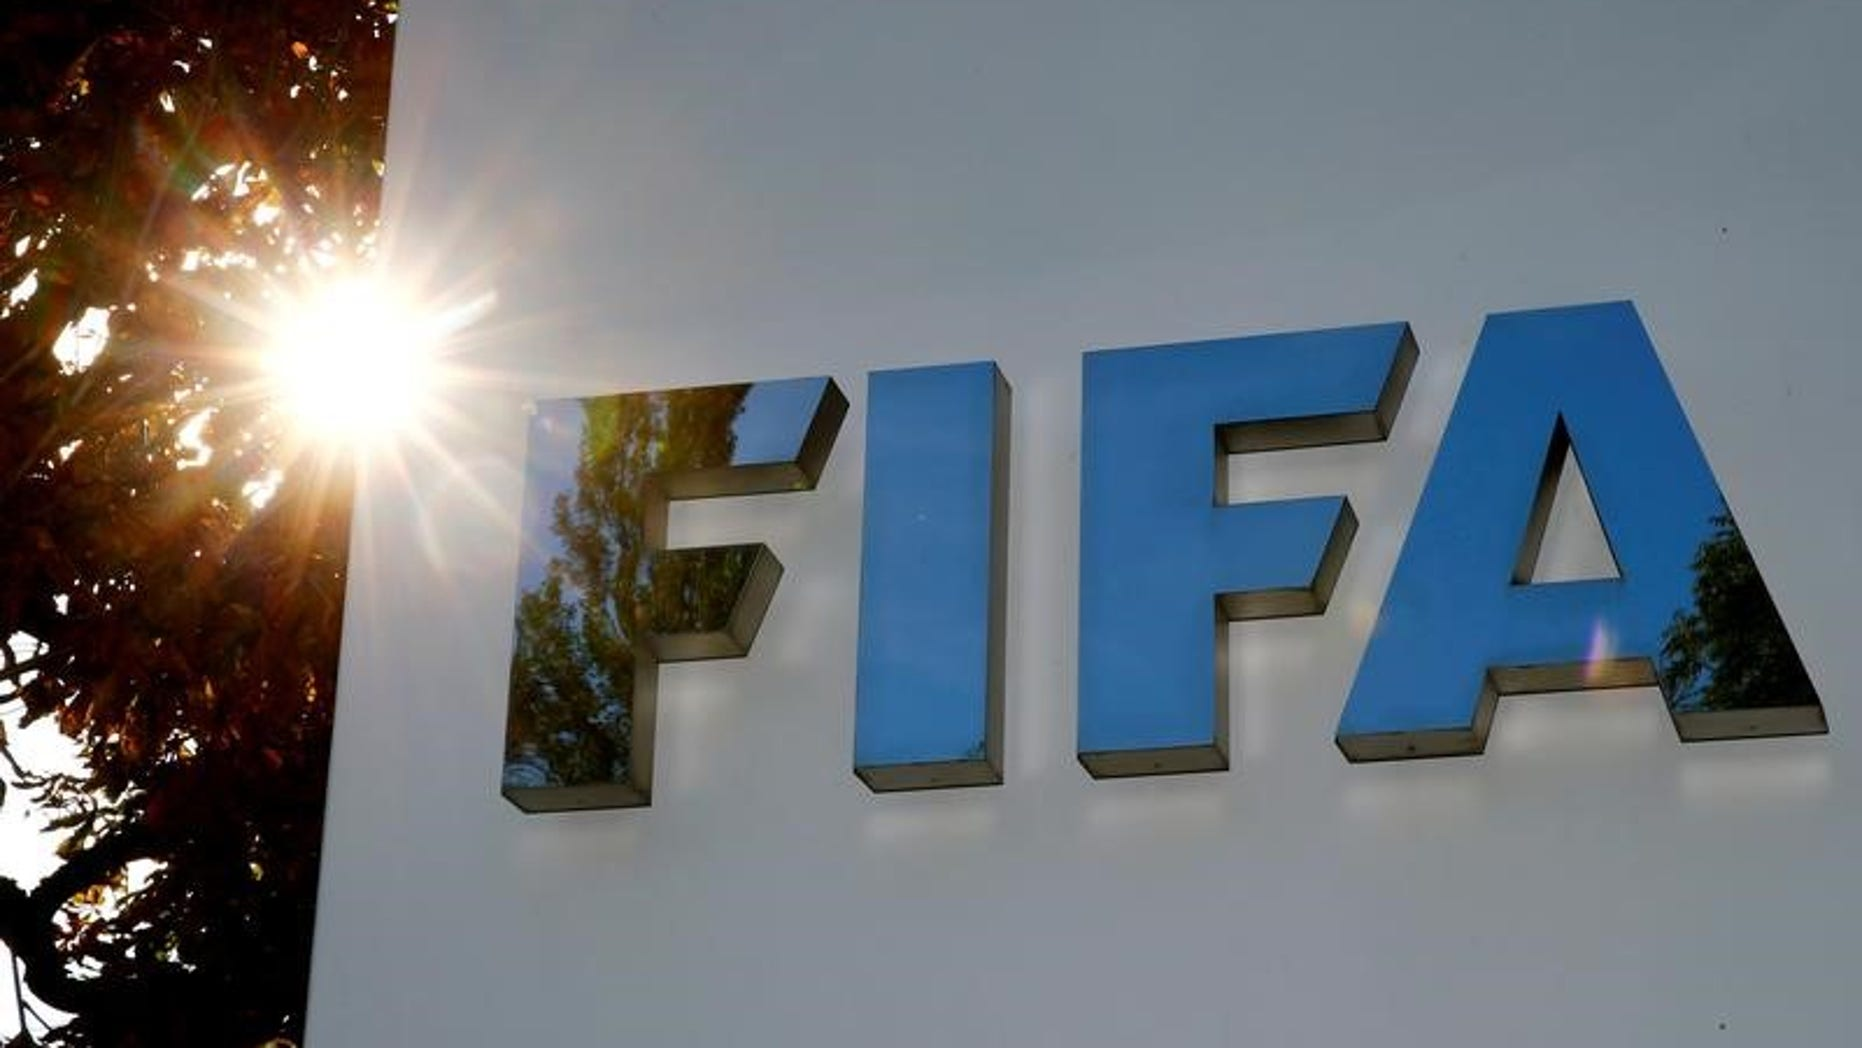 The logo of FIFA is seen in front of its headquarters in Zurich, Switzerland September 26, 2017. REUTERS/Arnd Wiegmann